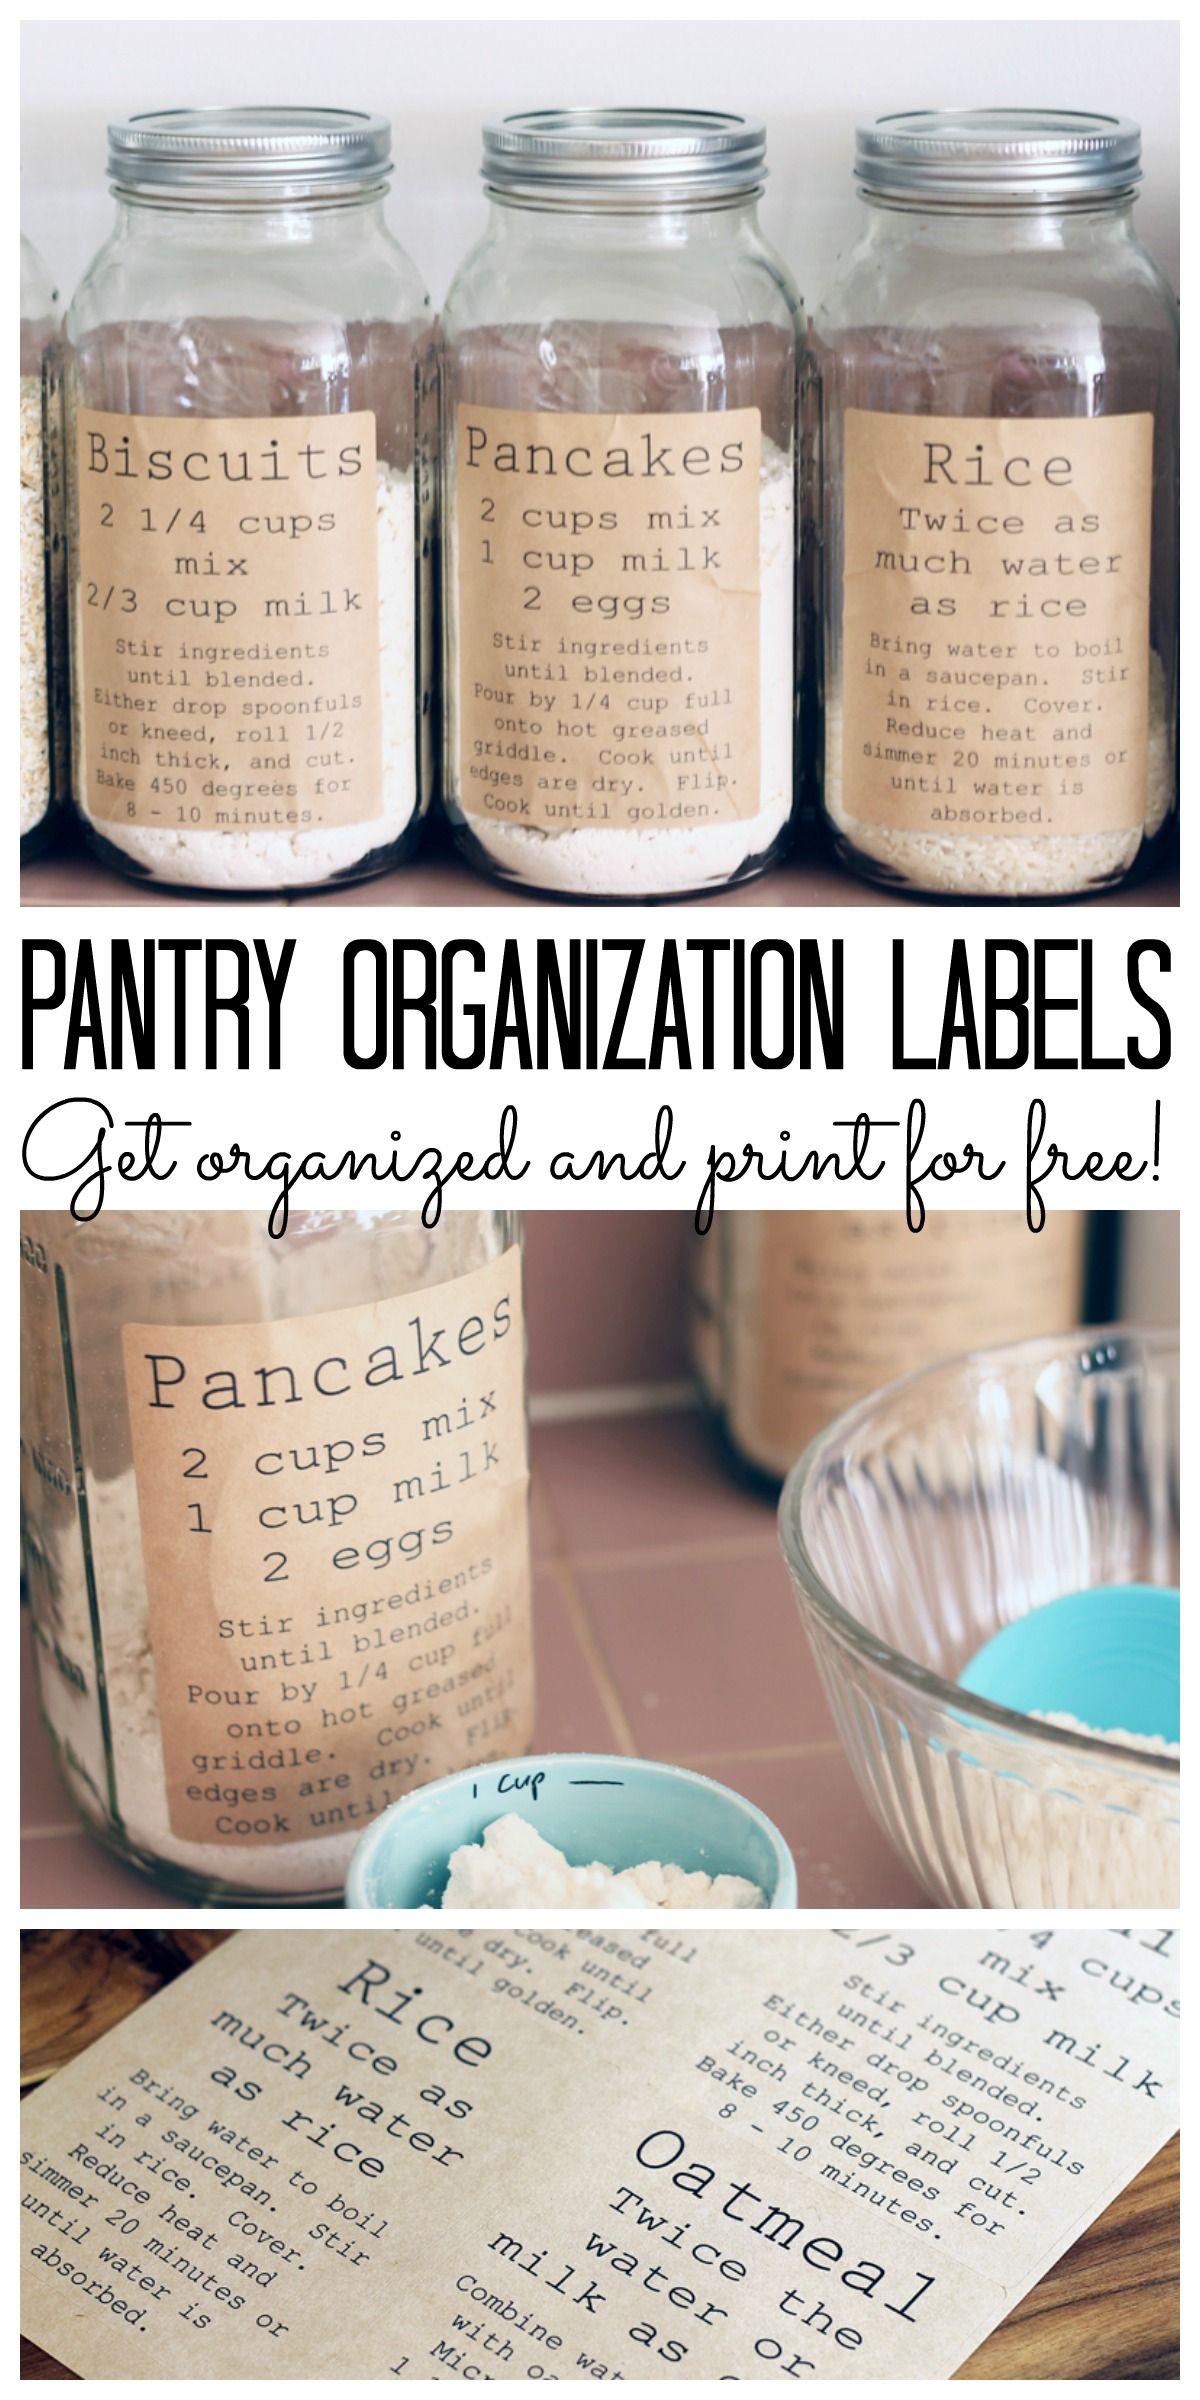 Pantry Organization Labels | Home organization | Pinterest ...